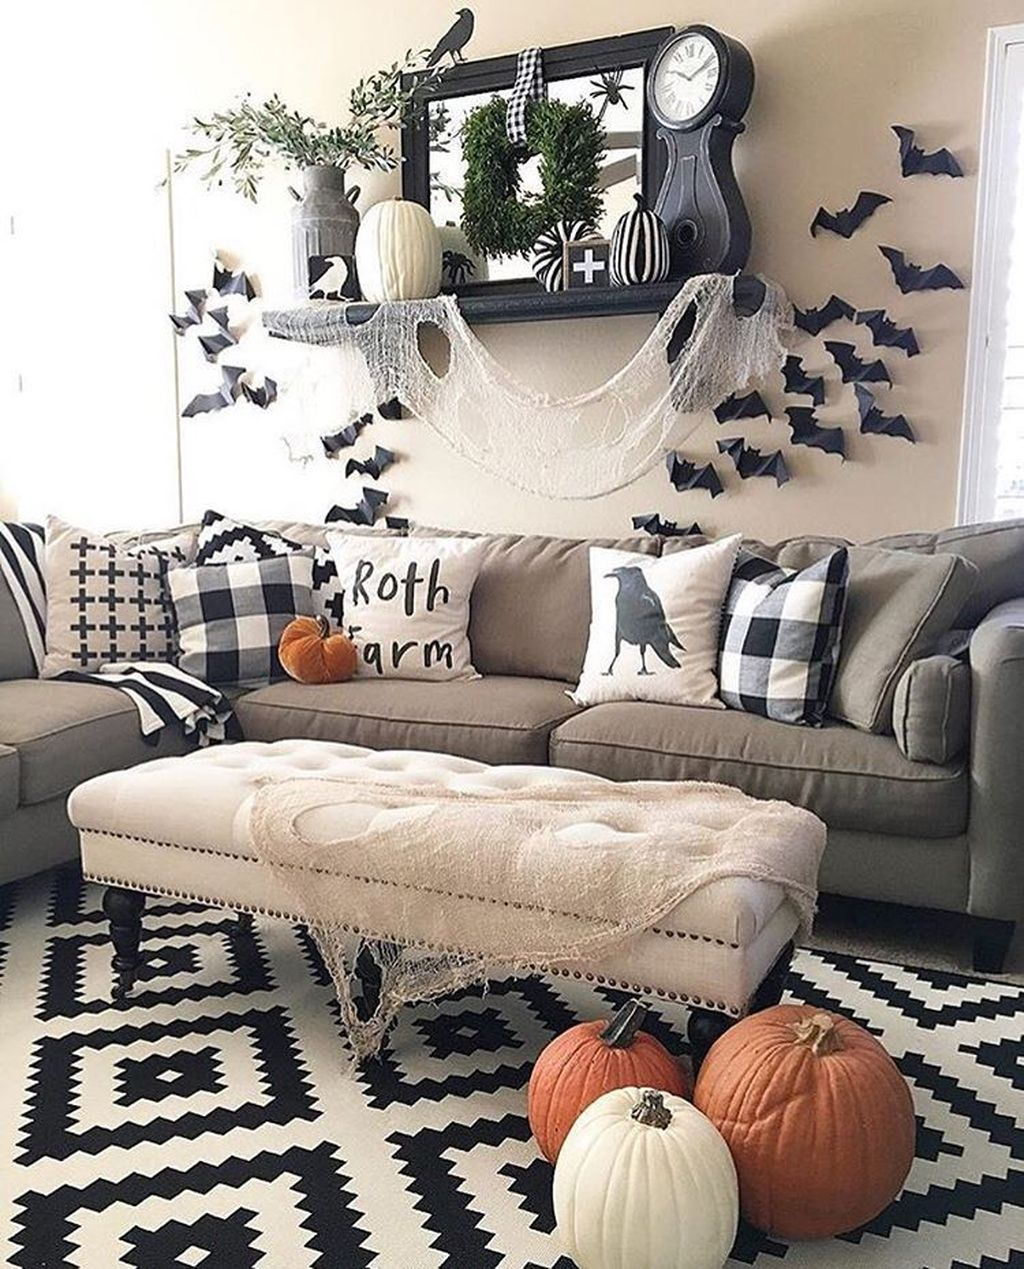 Decoomo Trends Home Decoration Ideas Halloween Living Room Halloween Home Decor Fall Home Decor